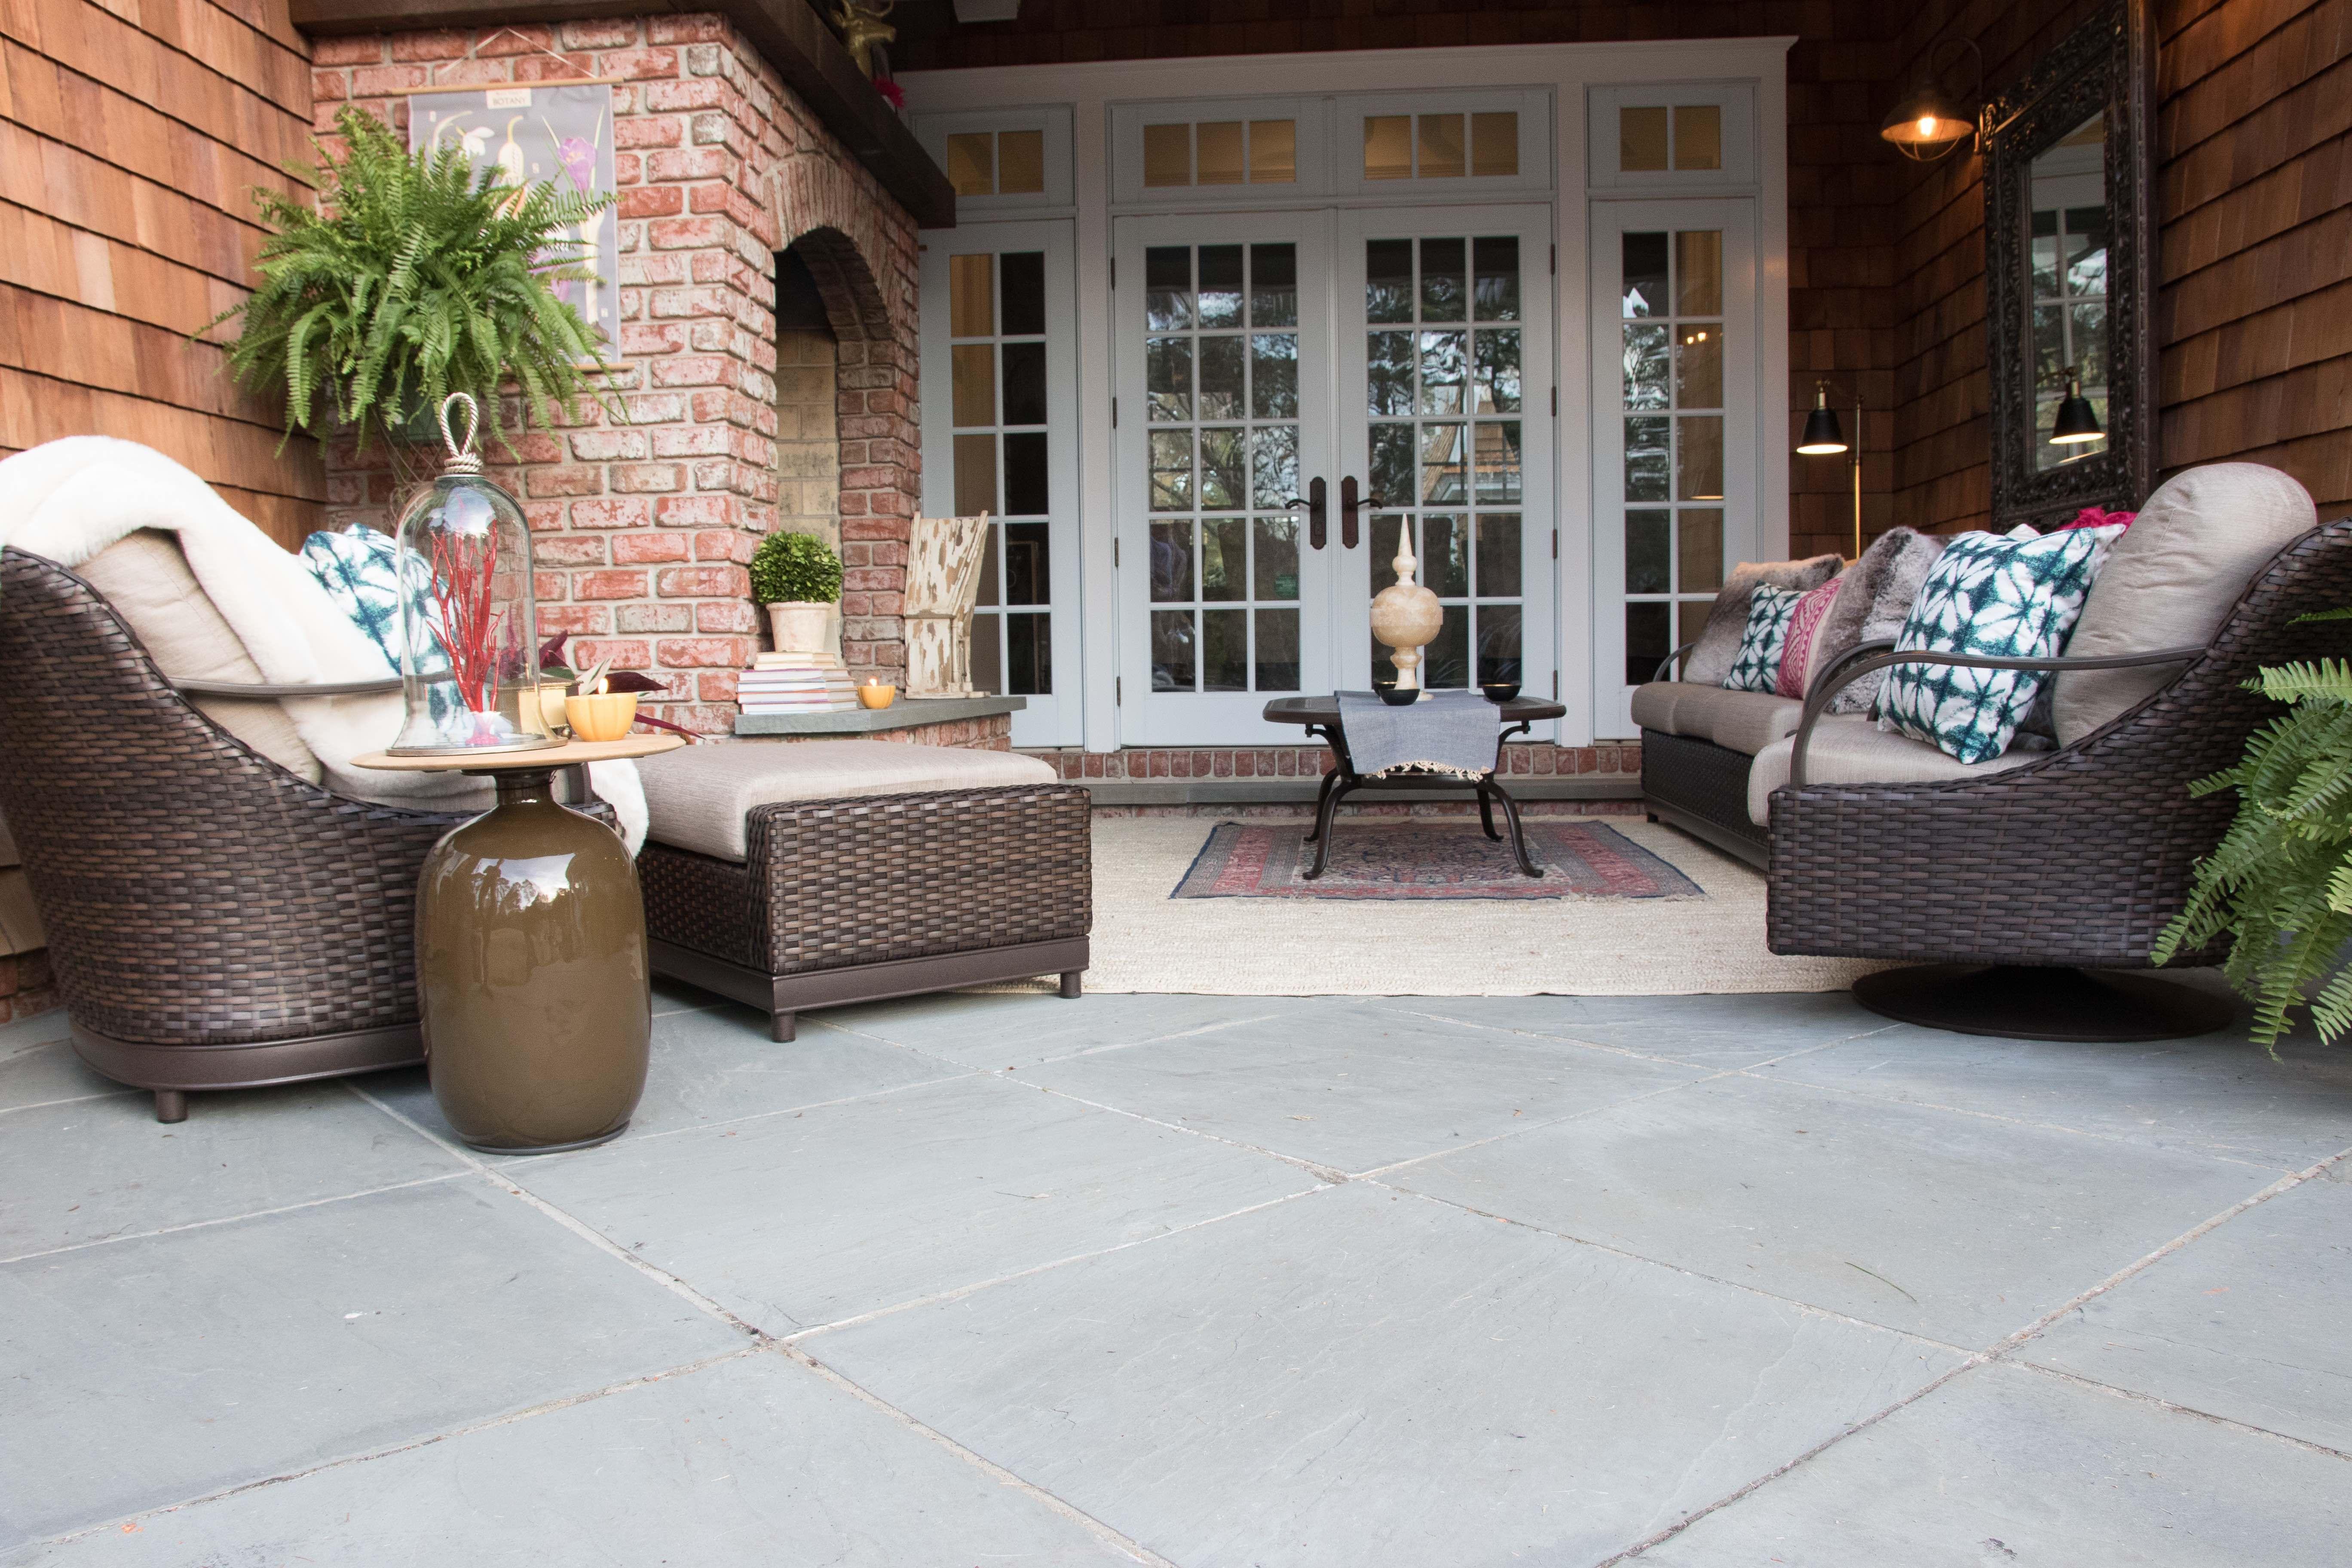 Tropitone Rustic Outdoor Furniture Backyard Staycation Rustic Outdoor Furniture Covered Patio Design